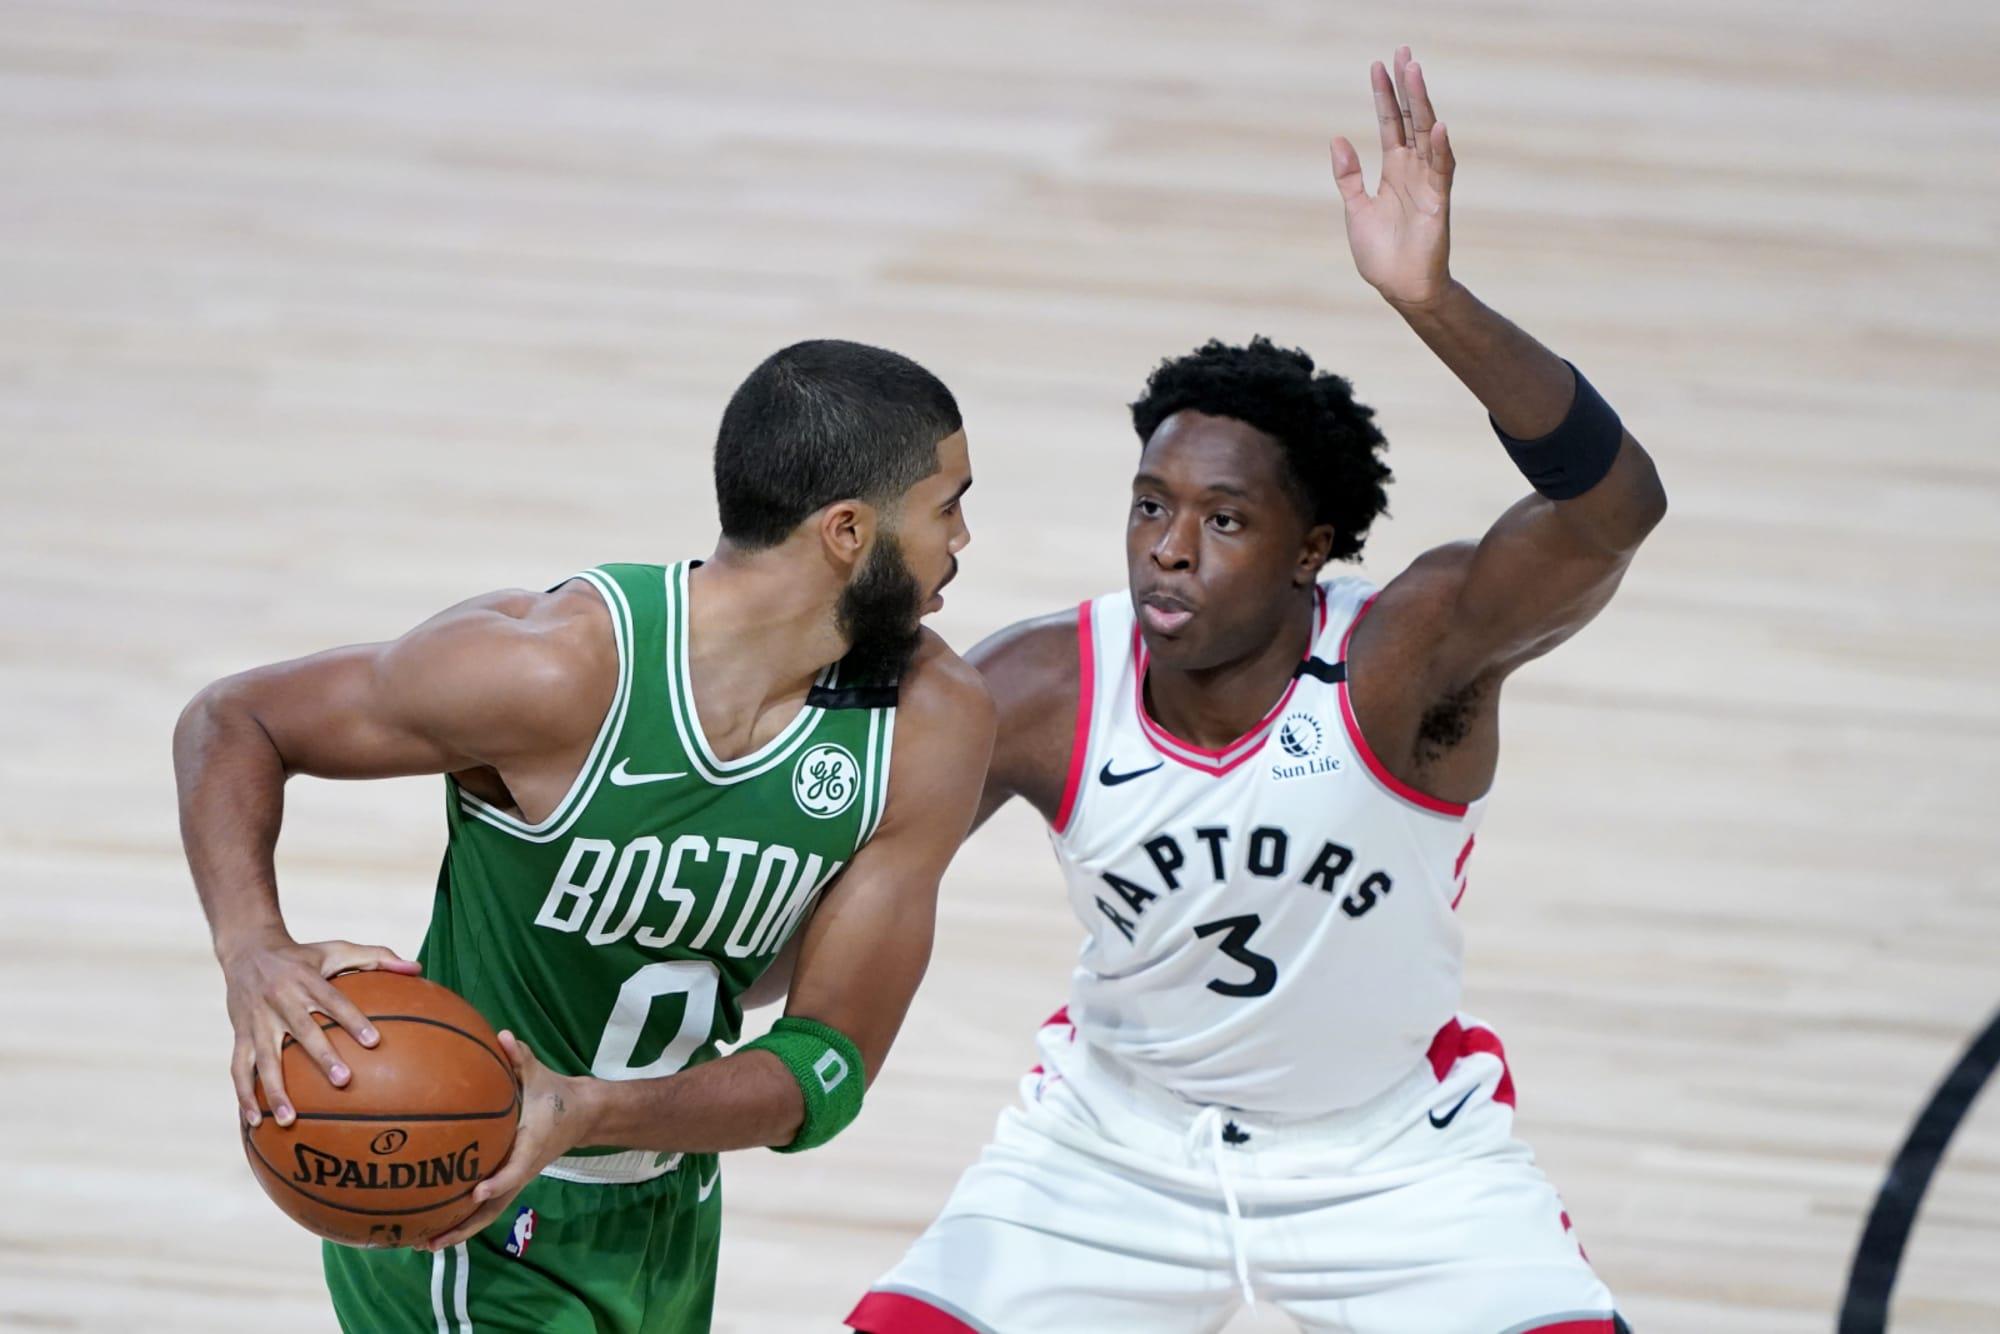 Toronto Raptors Vs Boston Celtics How To Watch Live Stream For Game 3